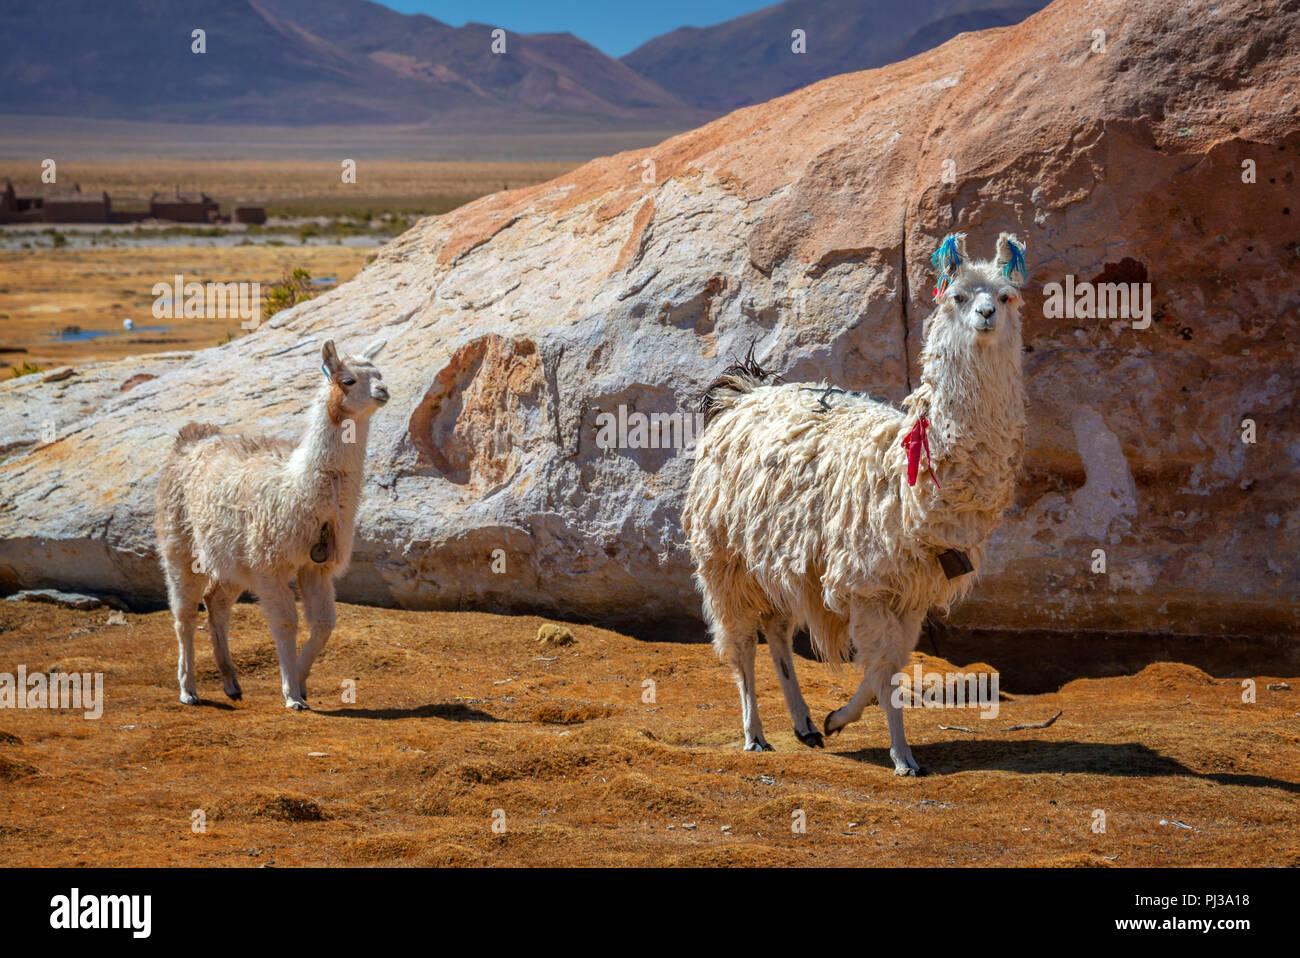 Domestic llamas grazing on the altiplano in Bolivia Stock Photo